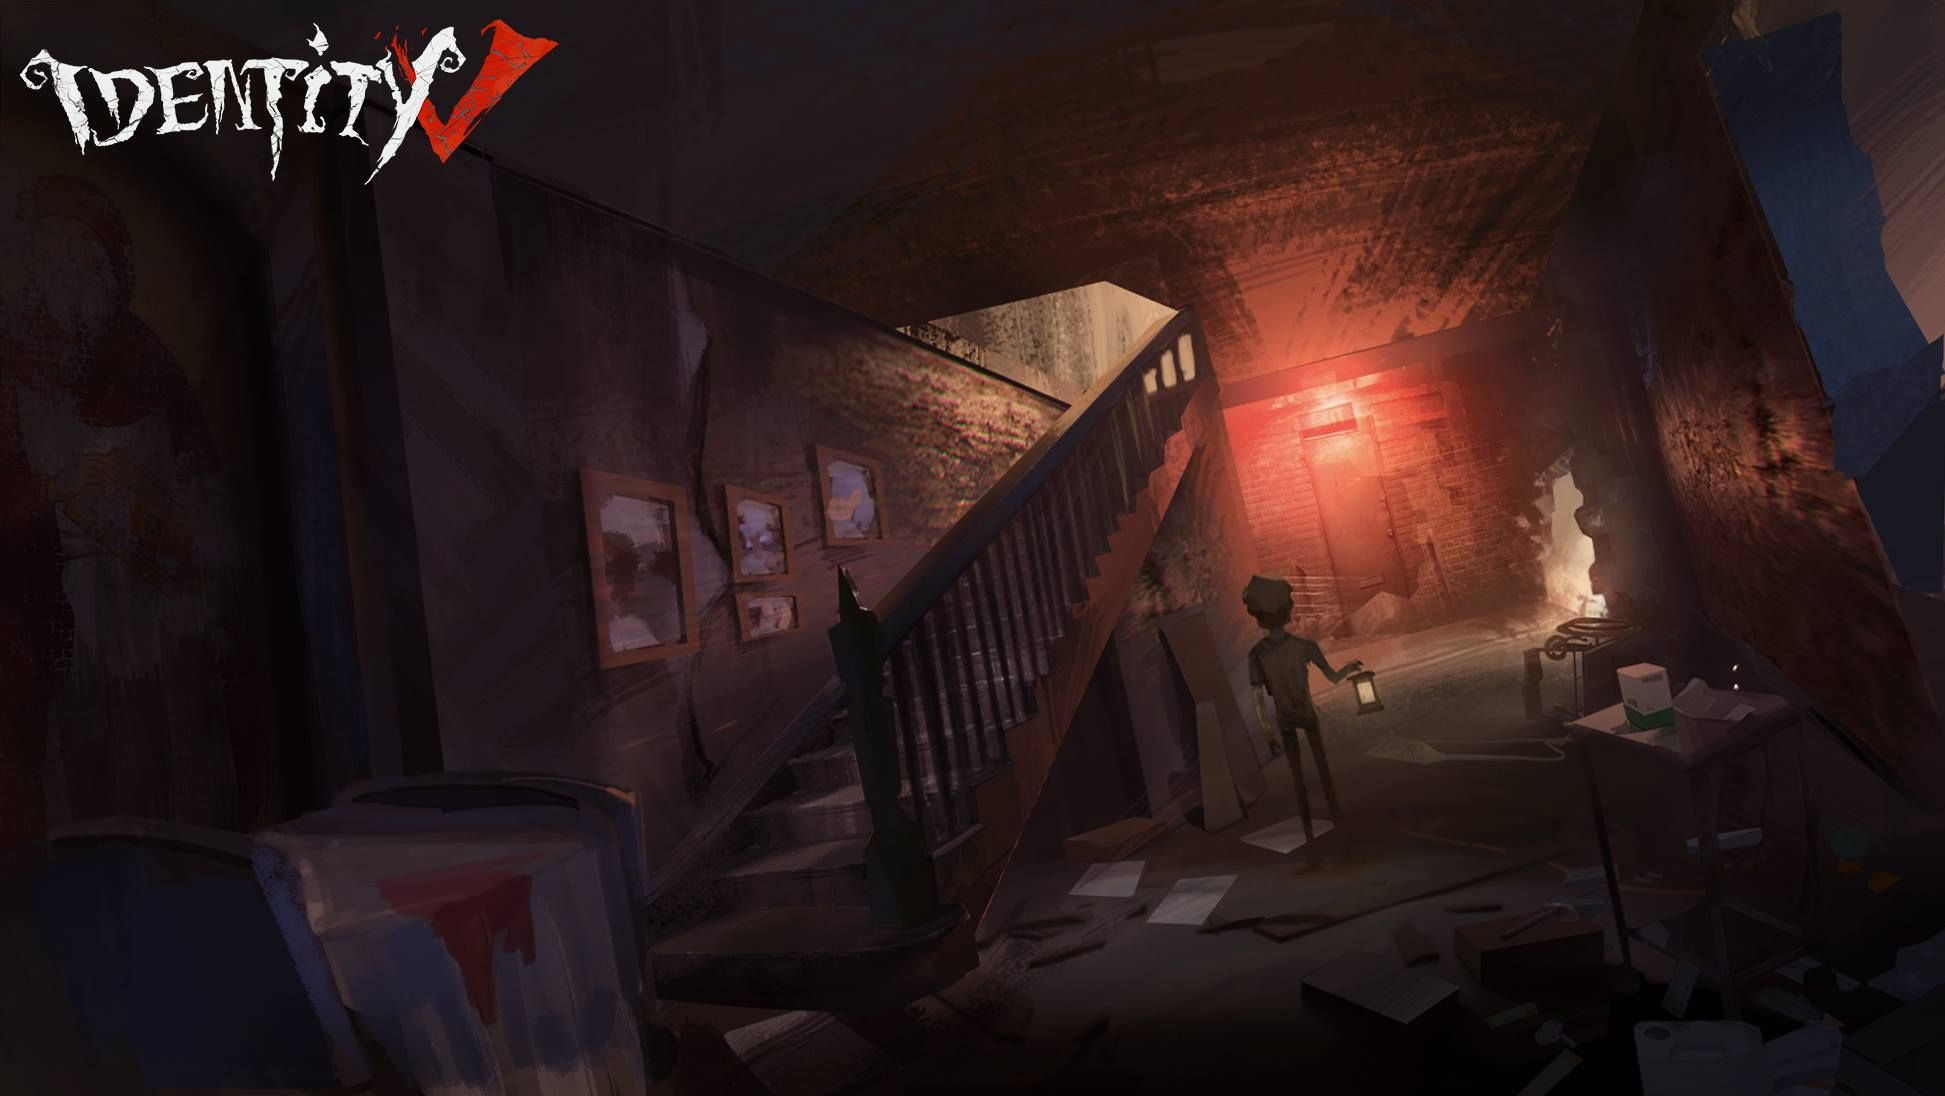 Real Girl Full Hd Wallpaper Identity V Mobile Horror Game Review This Thrilling